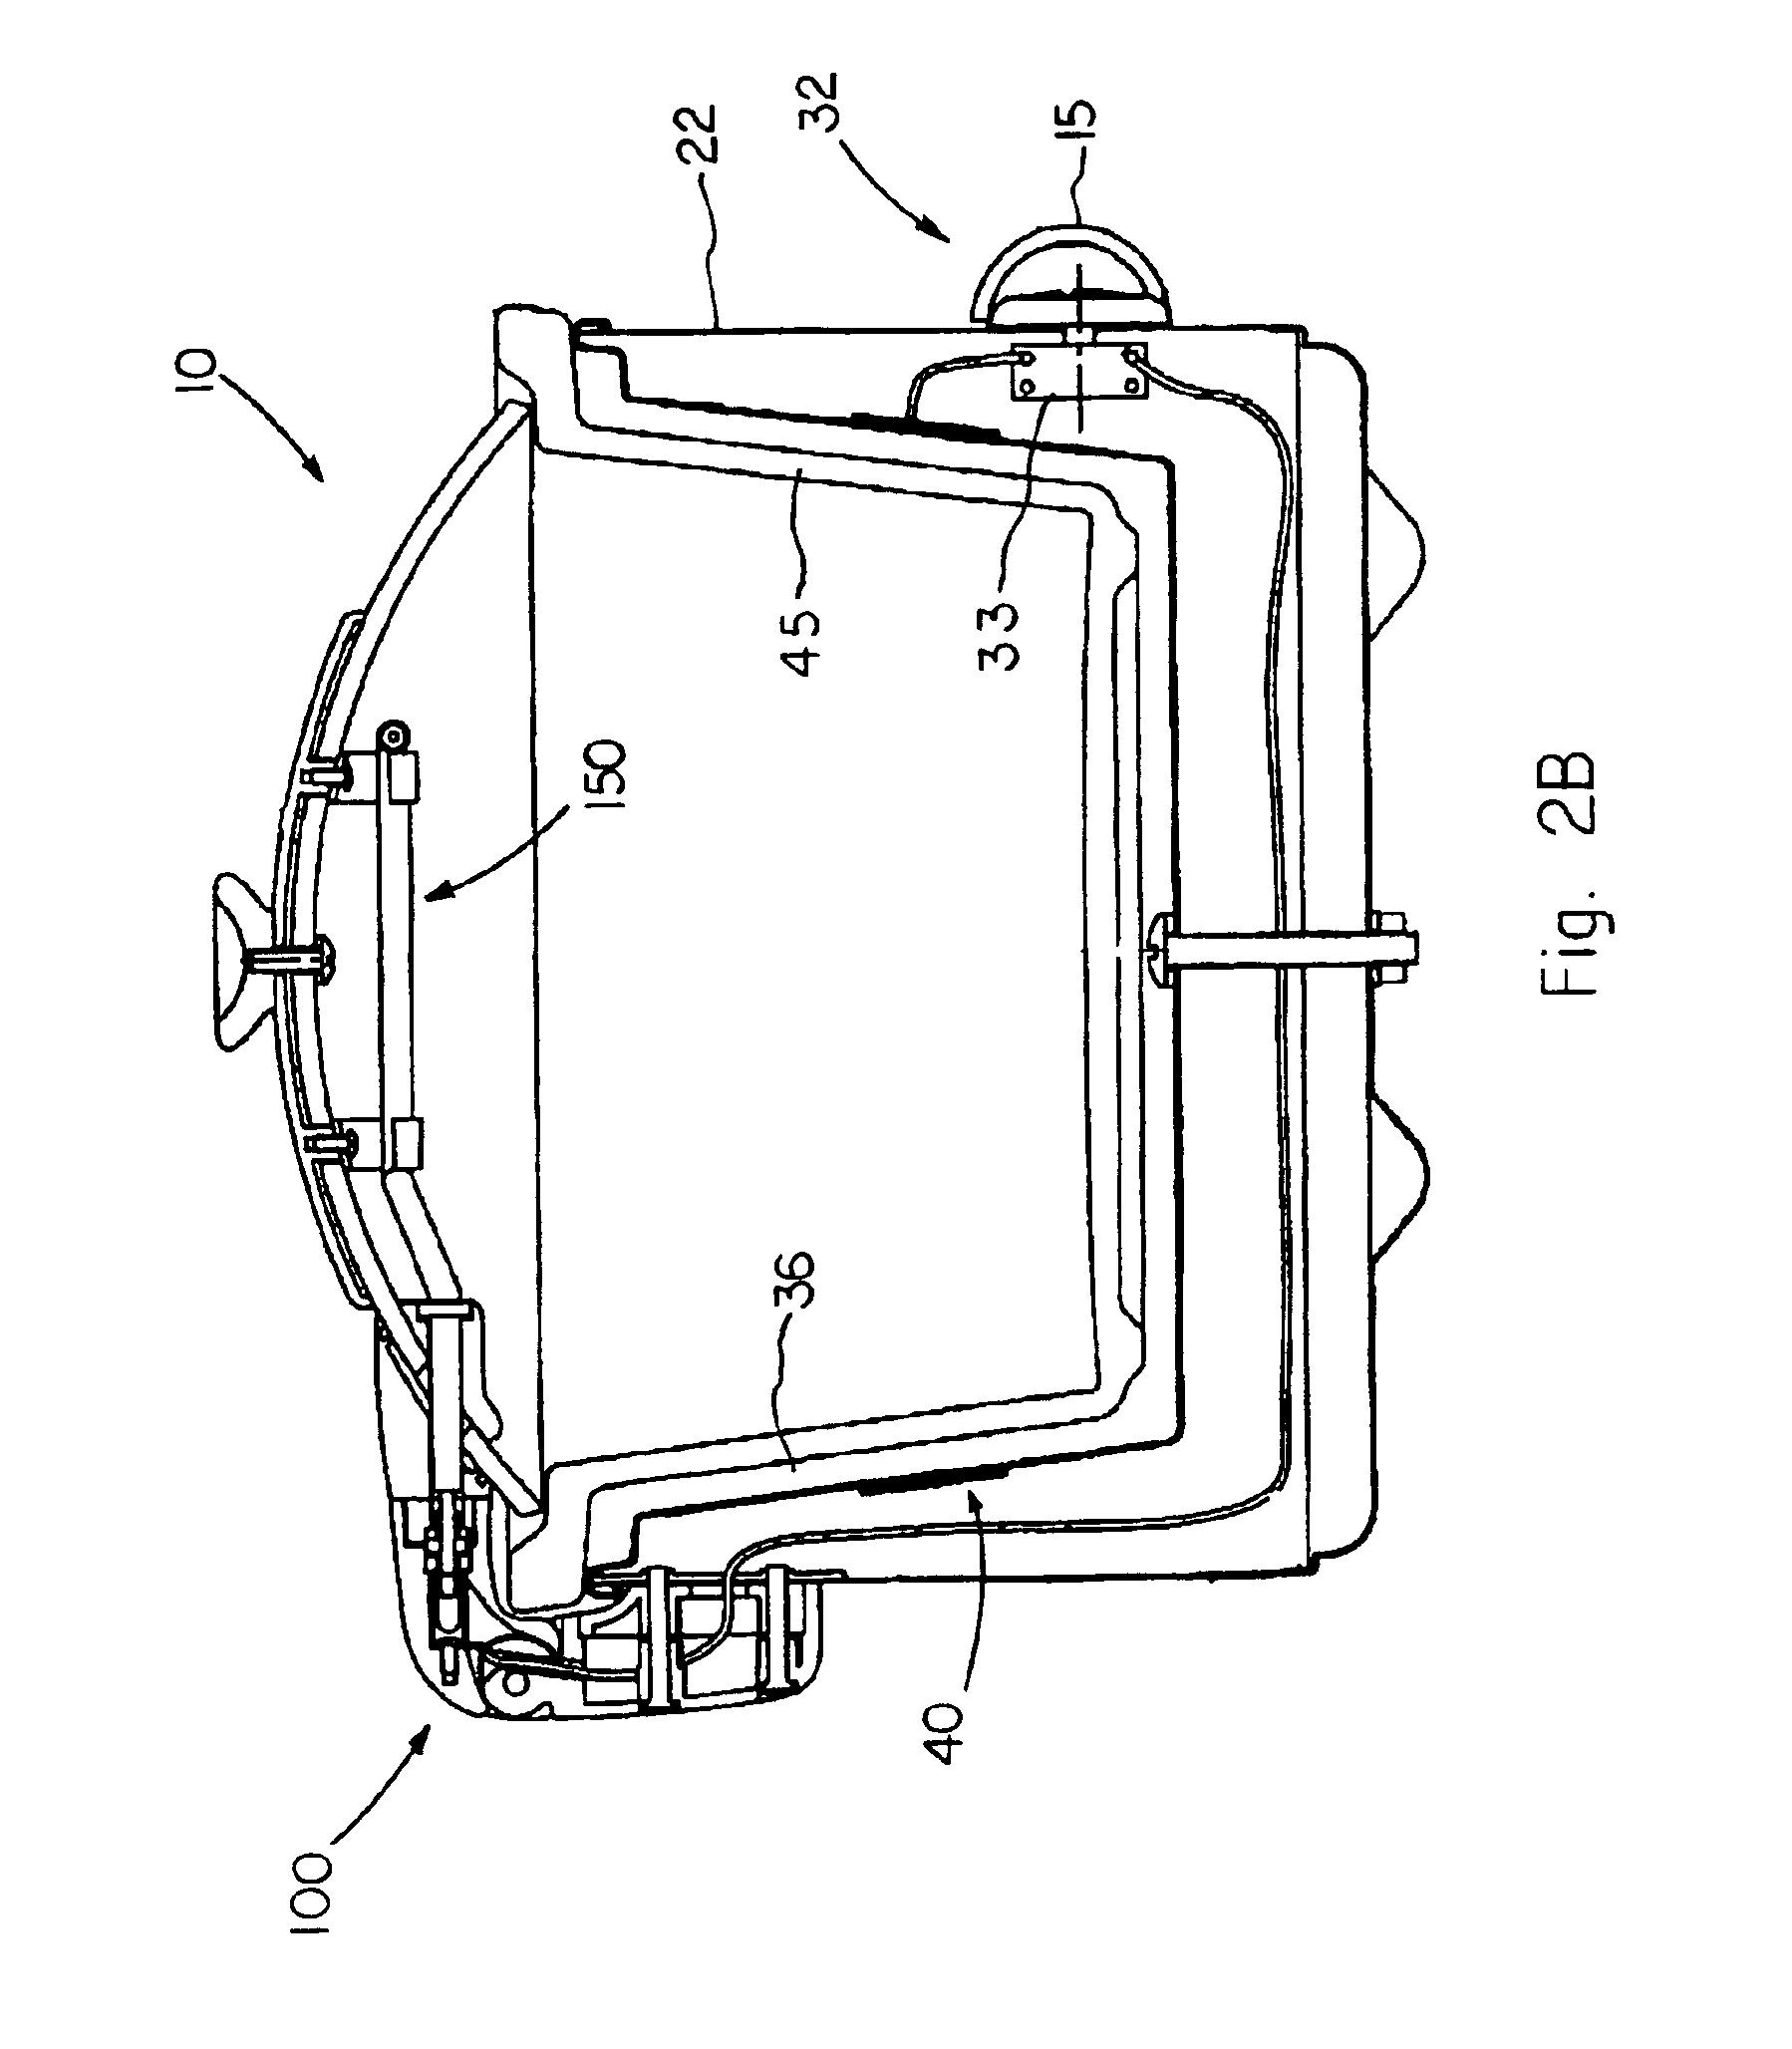 Crock Pot Wiring Diagram : 24 Wiring Diagram Images